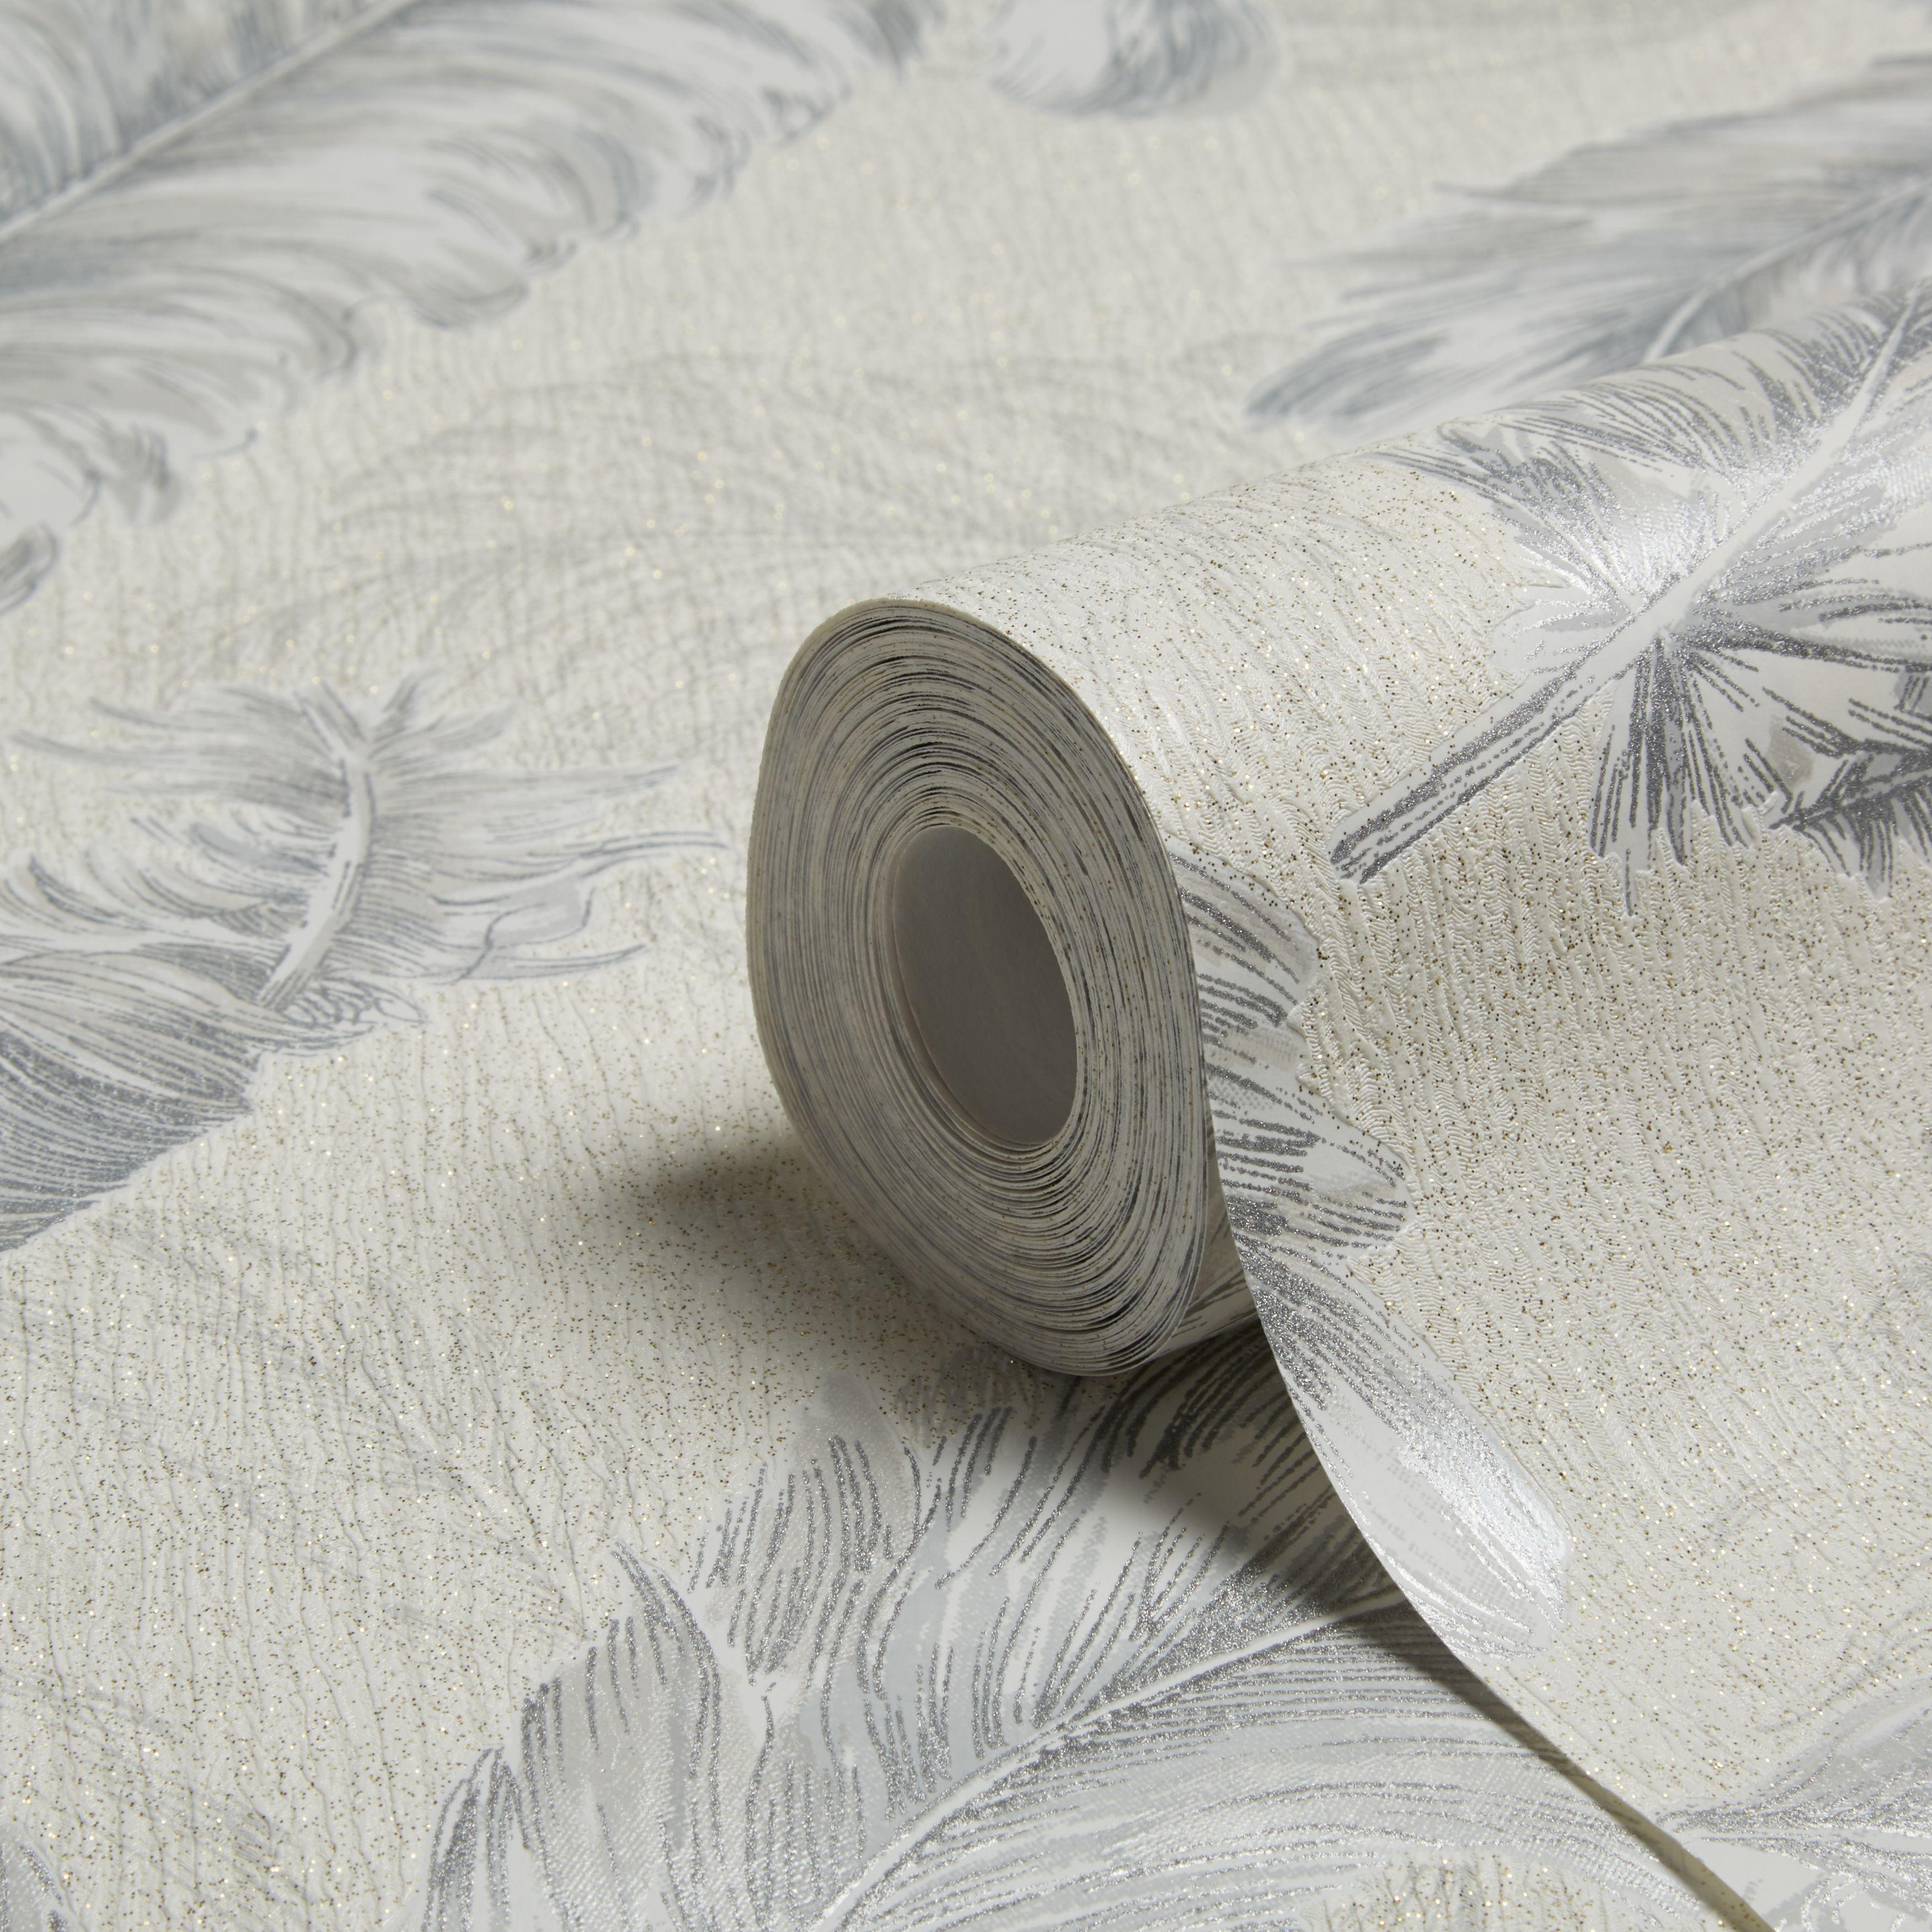 Graham Brown Julien Macdonald Silver White Wallpaper